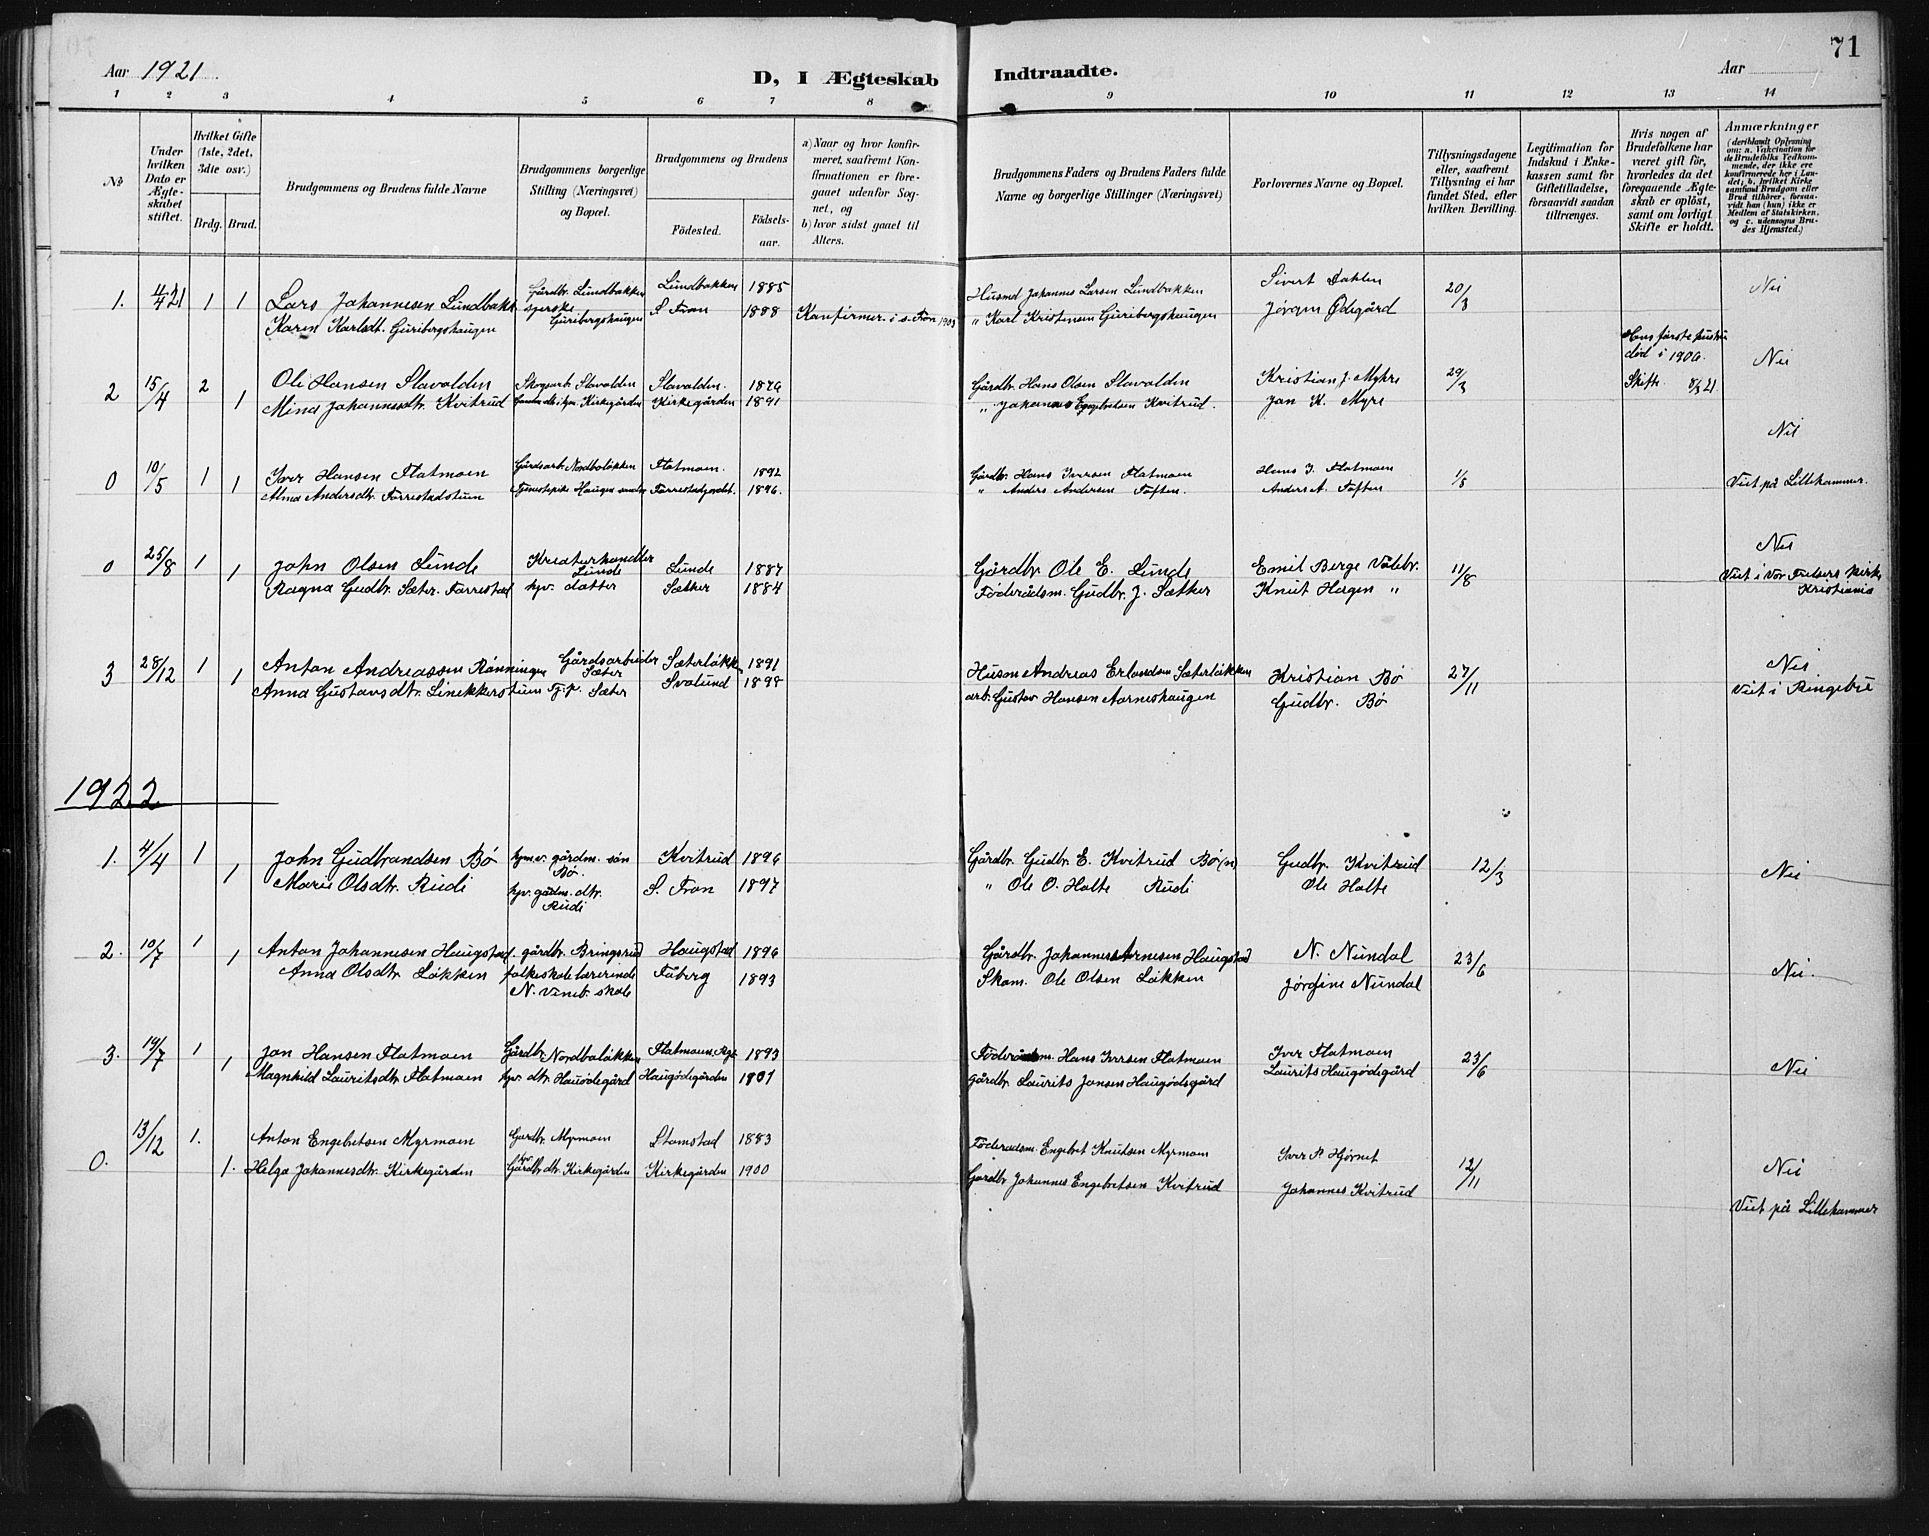 SAH, Ringebu prestekontor, Klokkerbok nr. 8, 1890-1922, s. 71